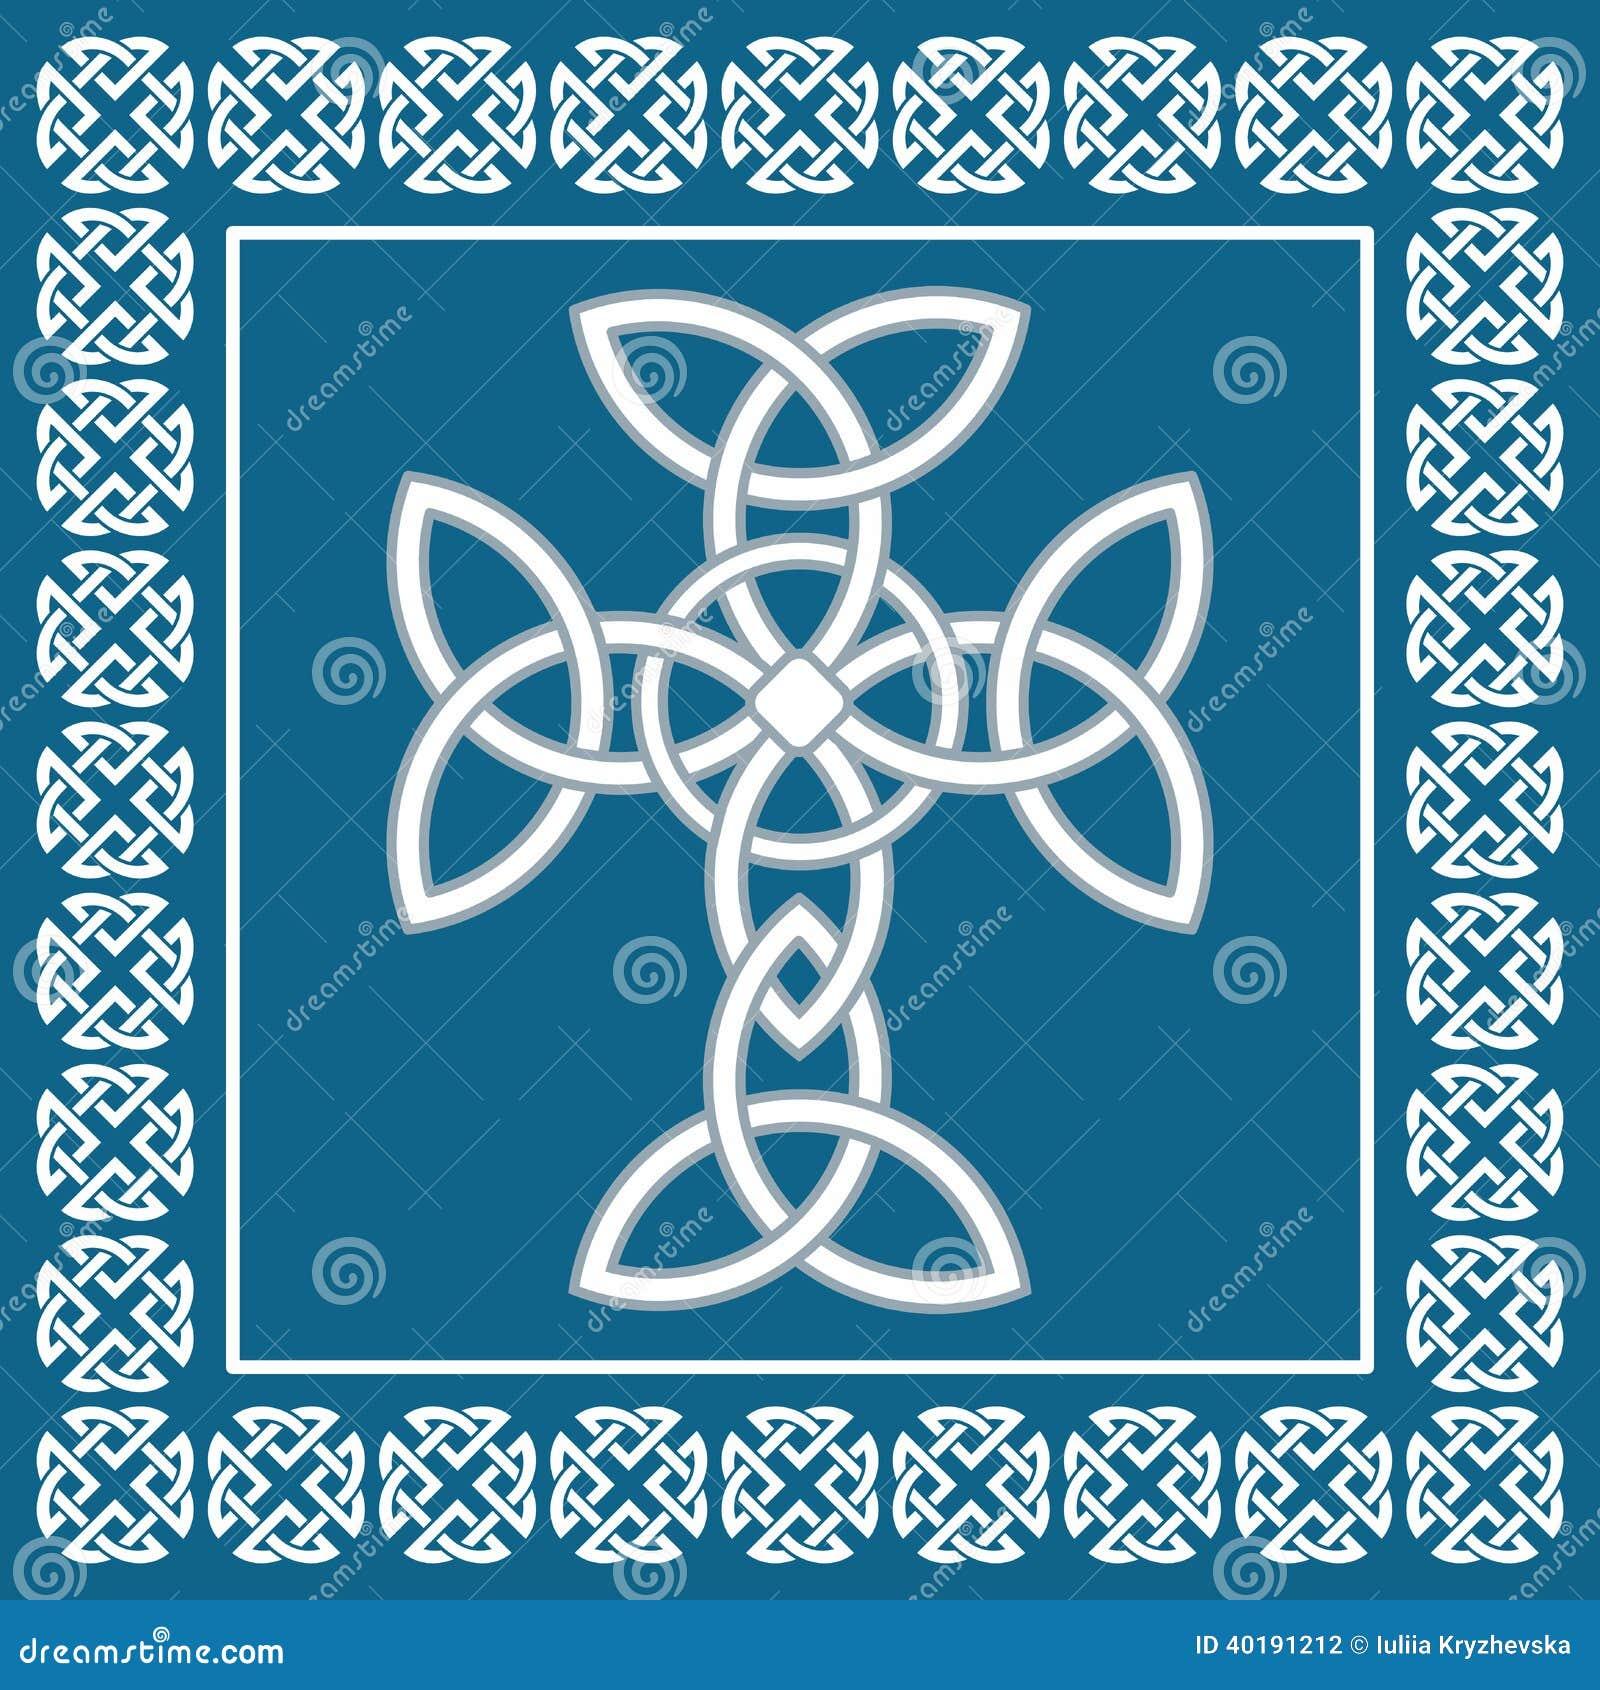 Celtic irish crosssymbolizes eternityvector illustration stock royalty free stock photo buycottarizona Image collections